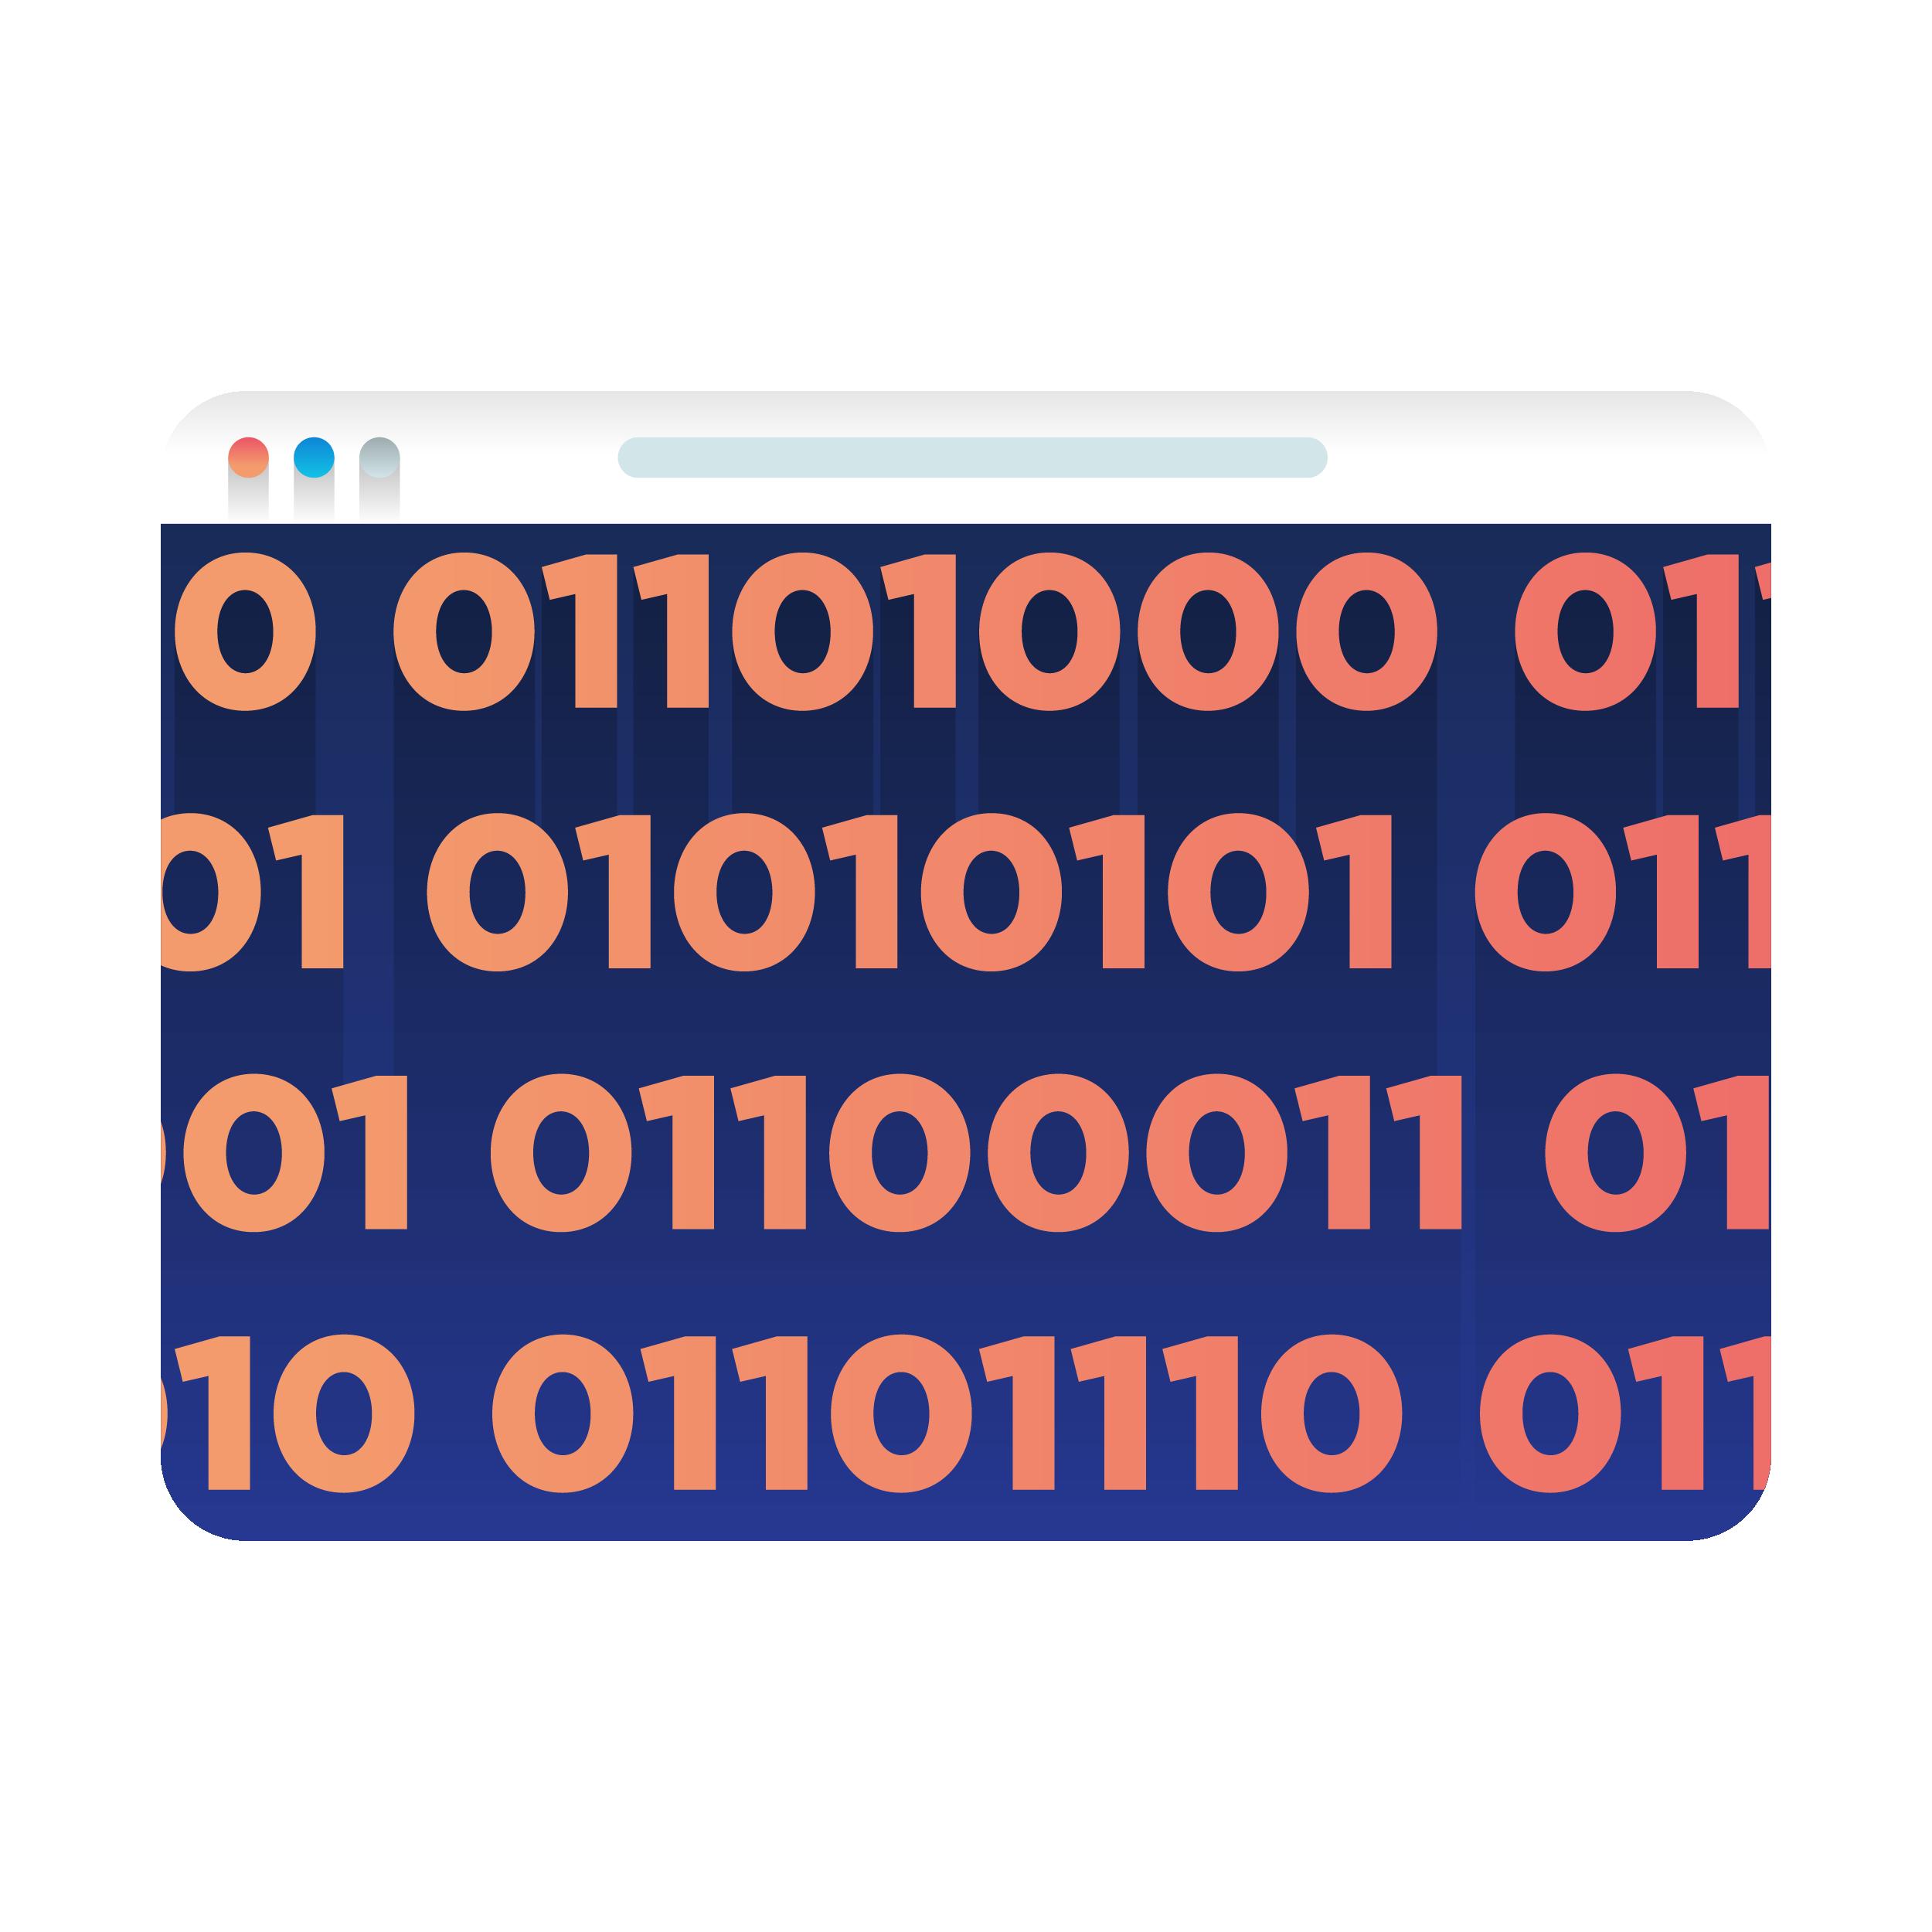 Source data icon